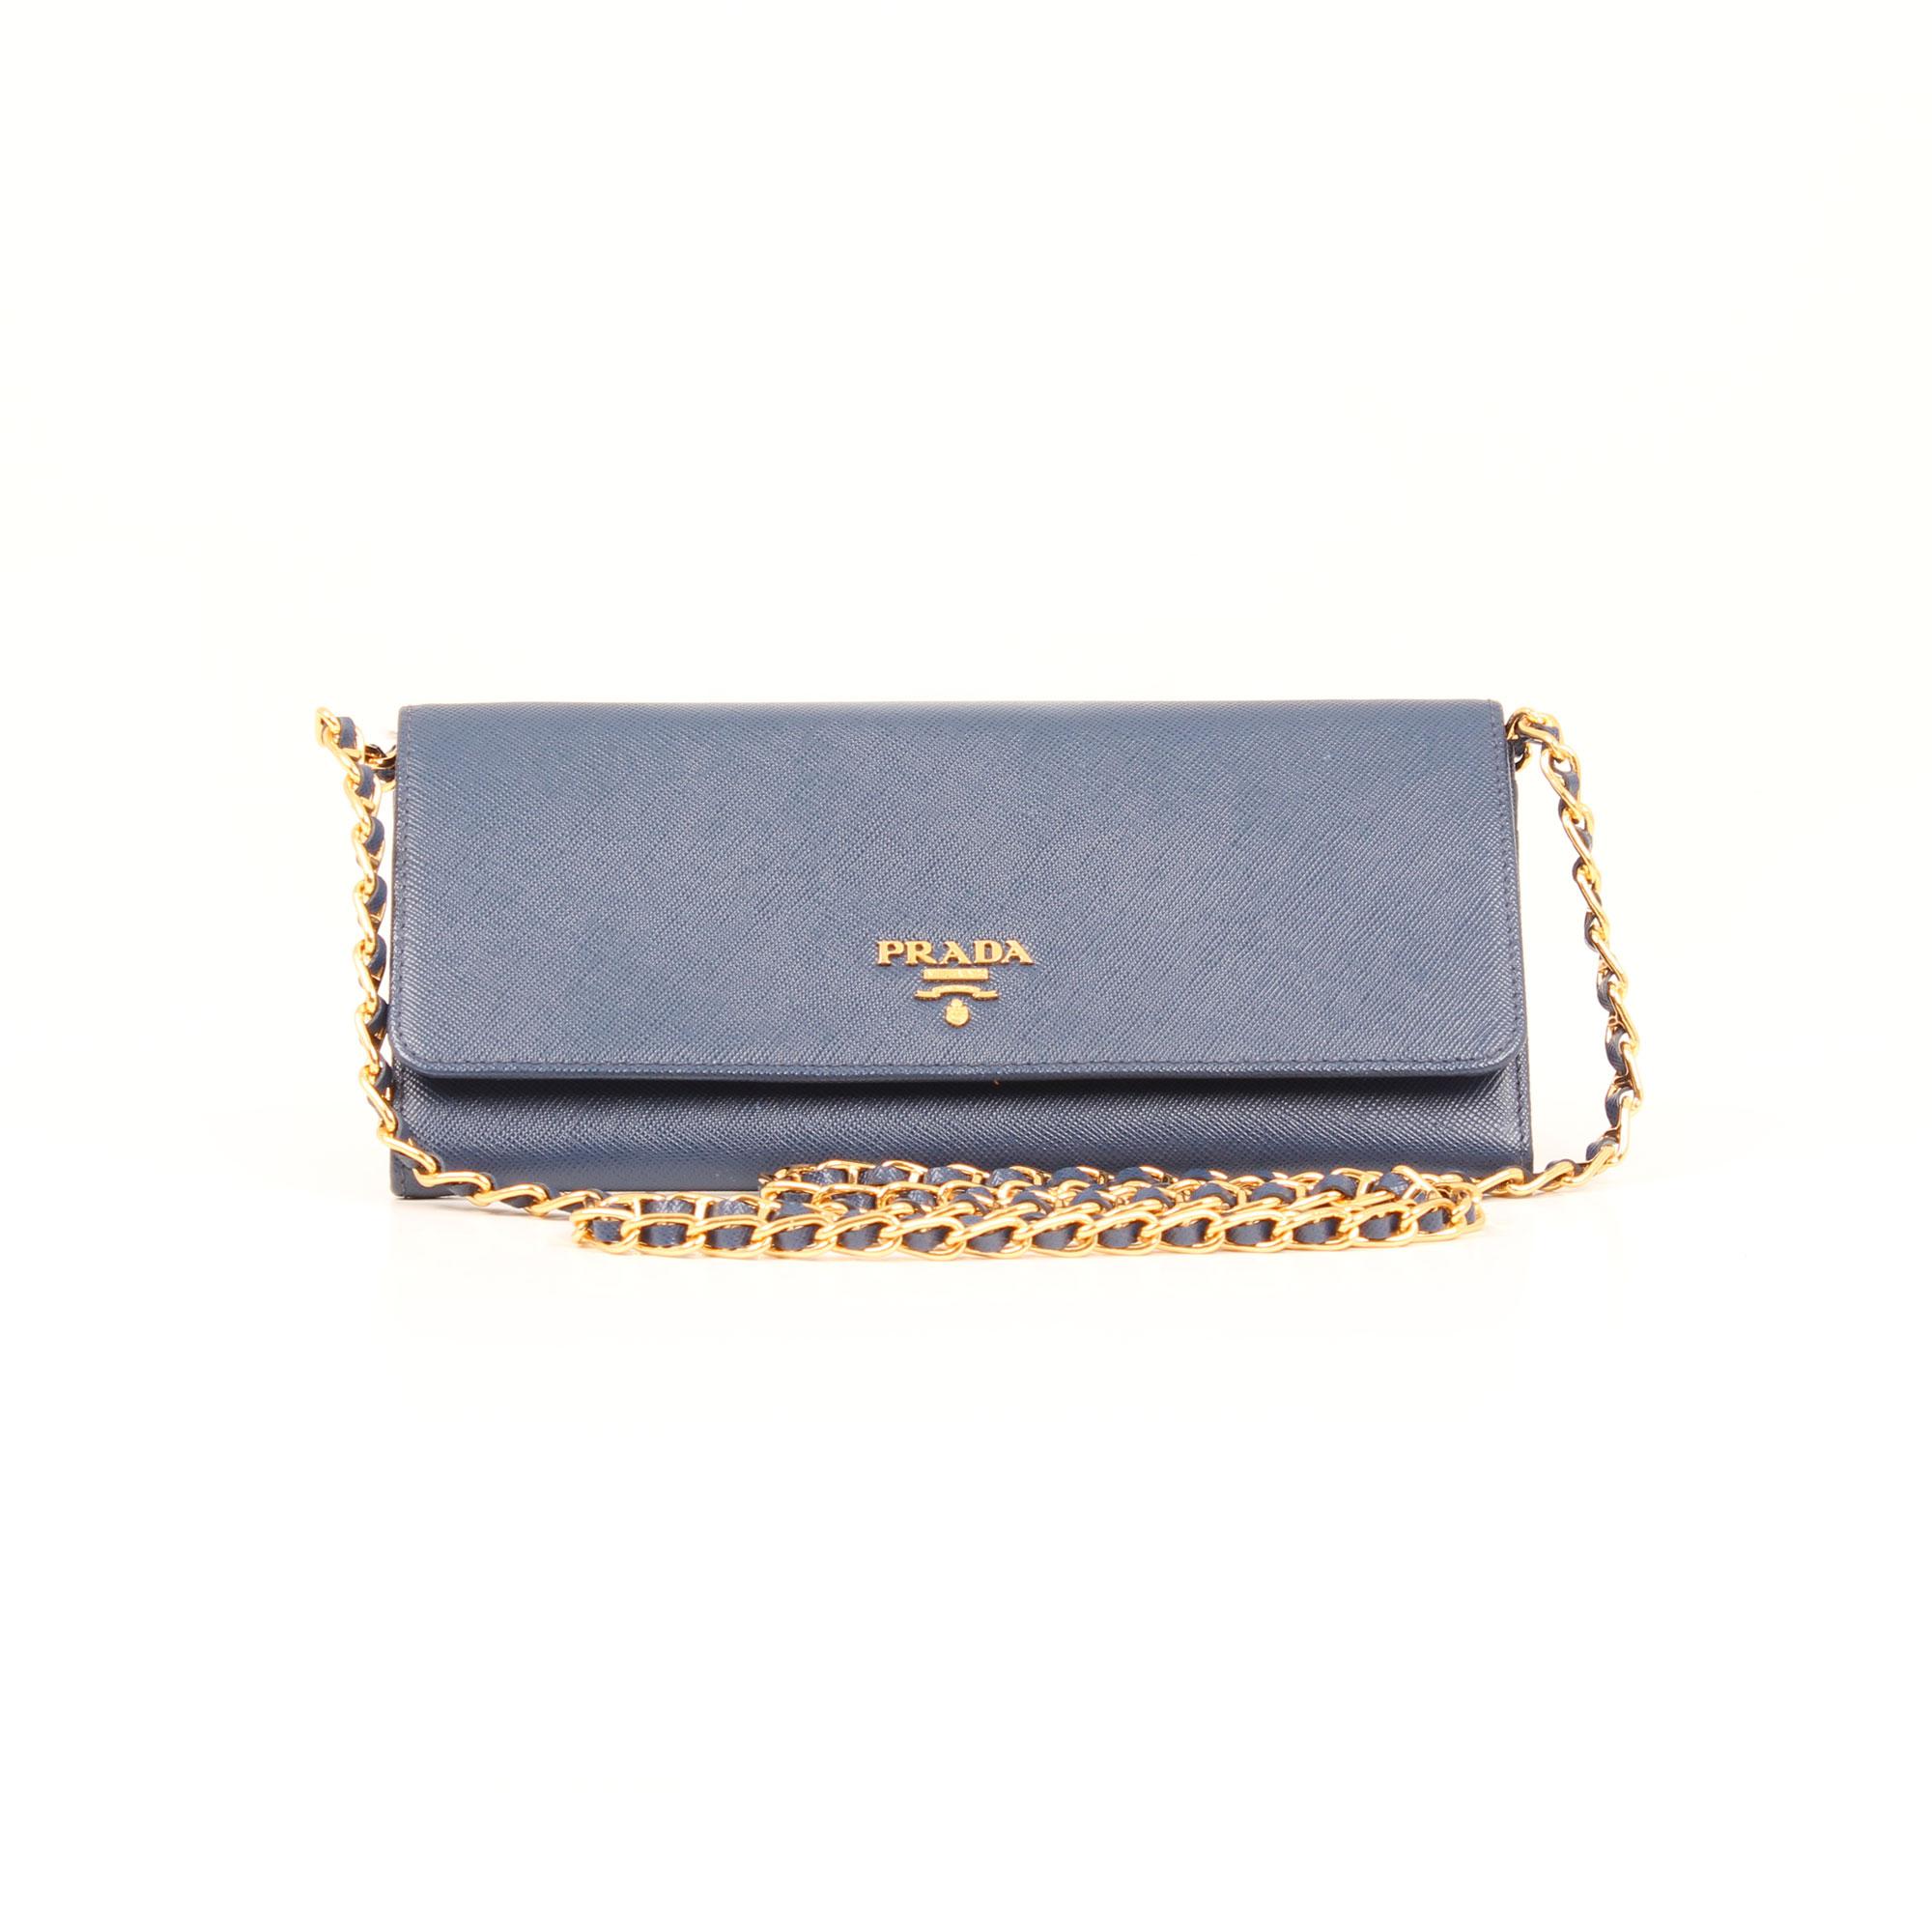 bolso-prada-wallet-on-chain-saffiano-metal-bluette-azul-frontal